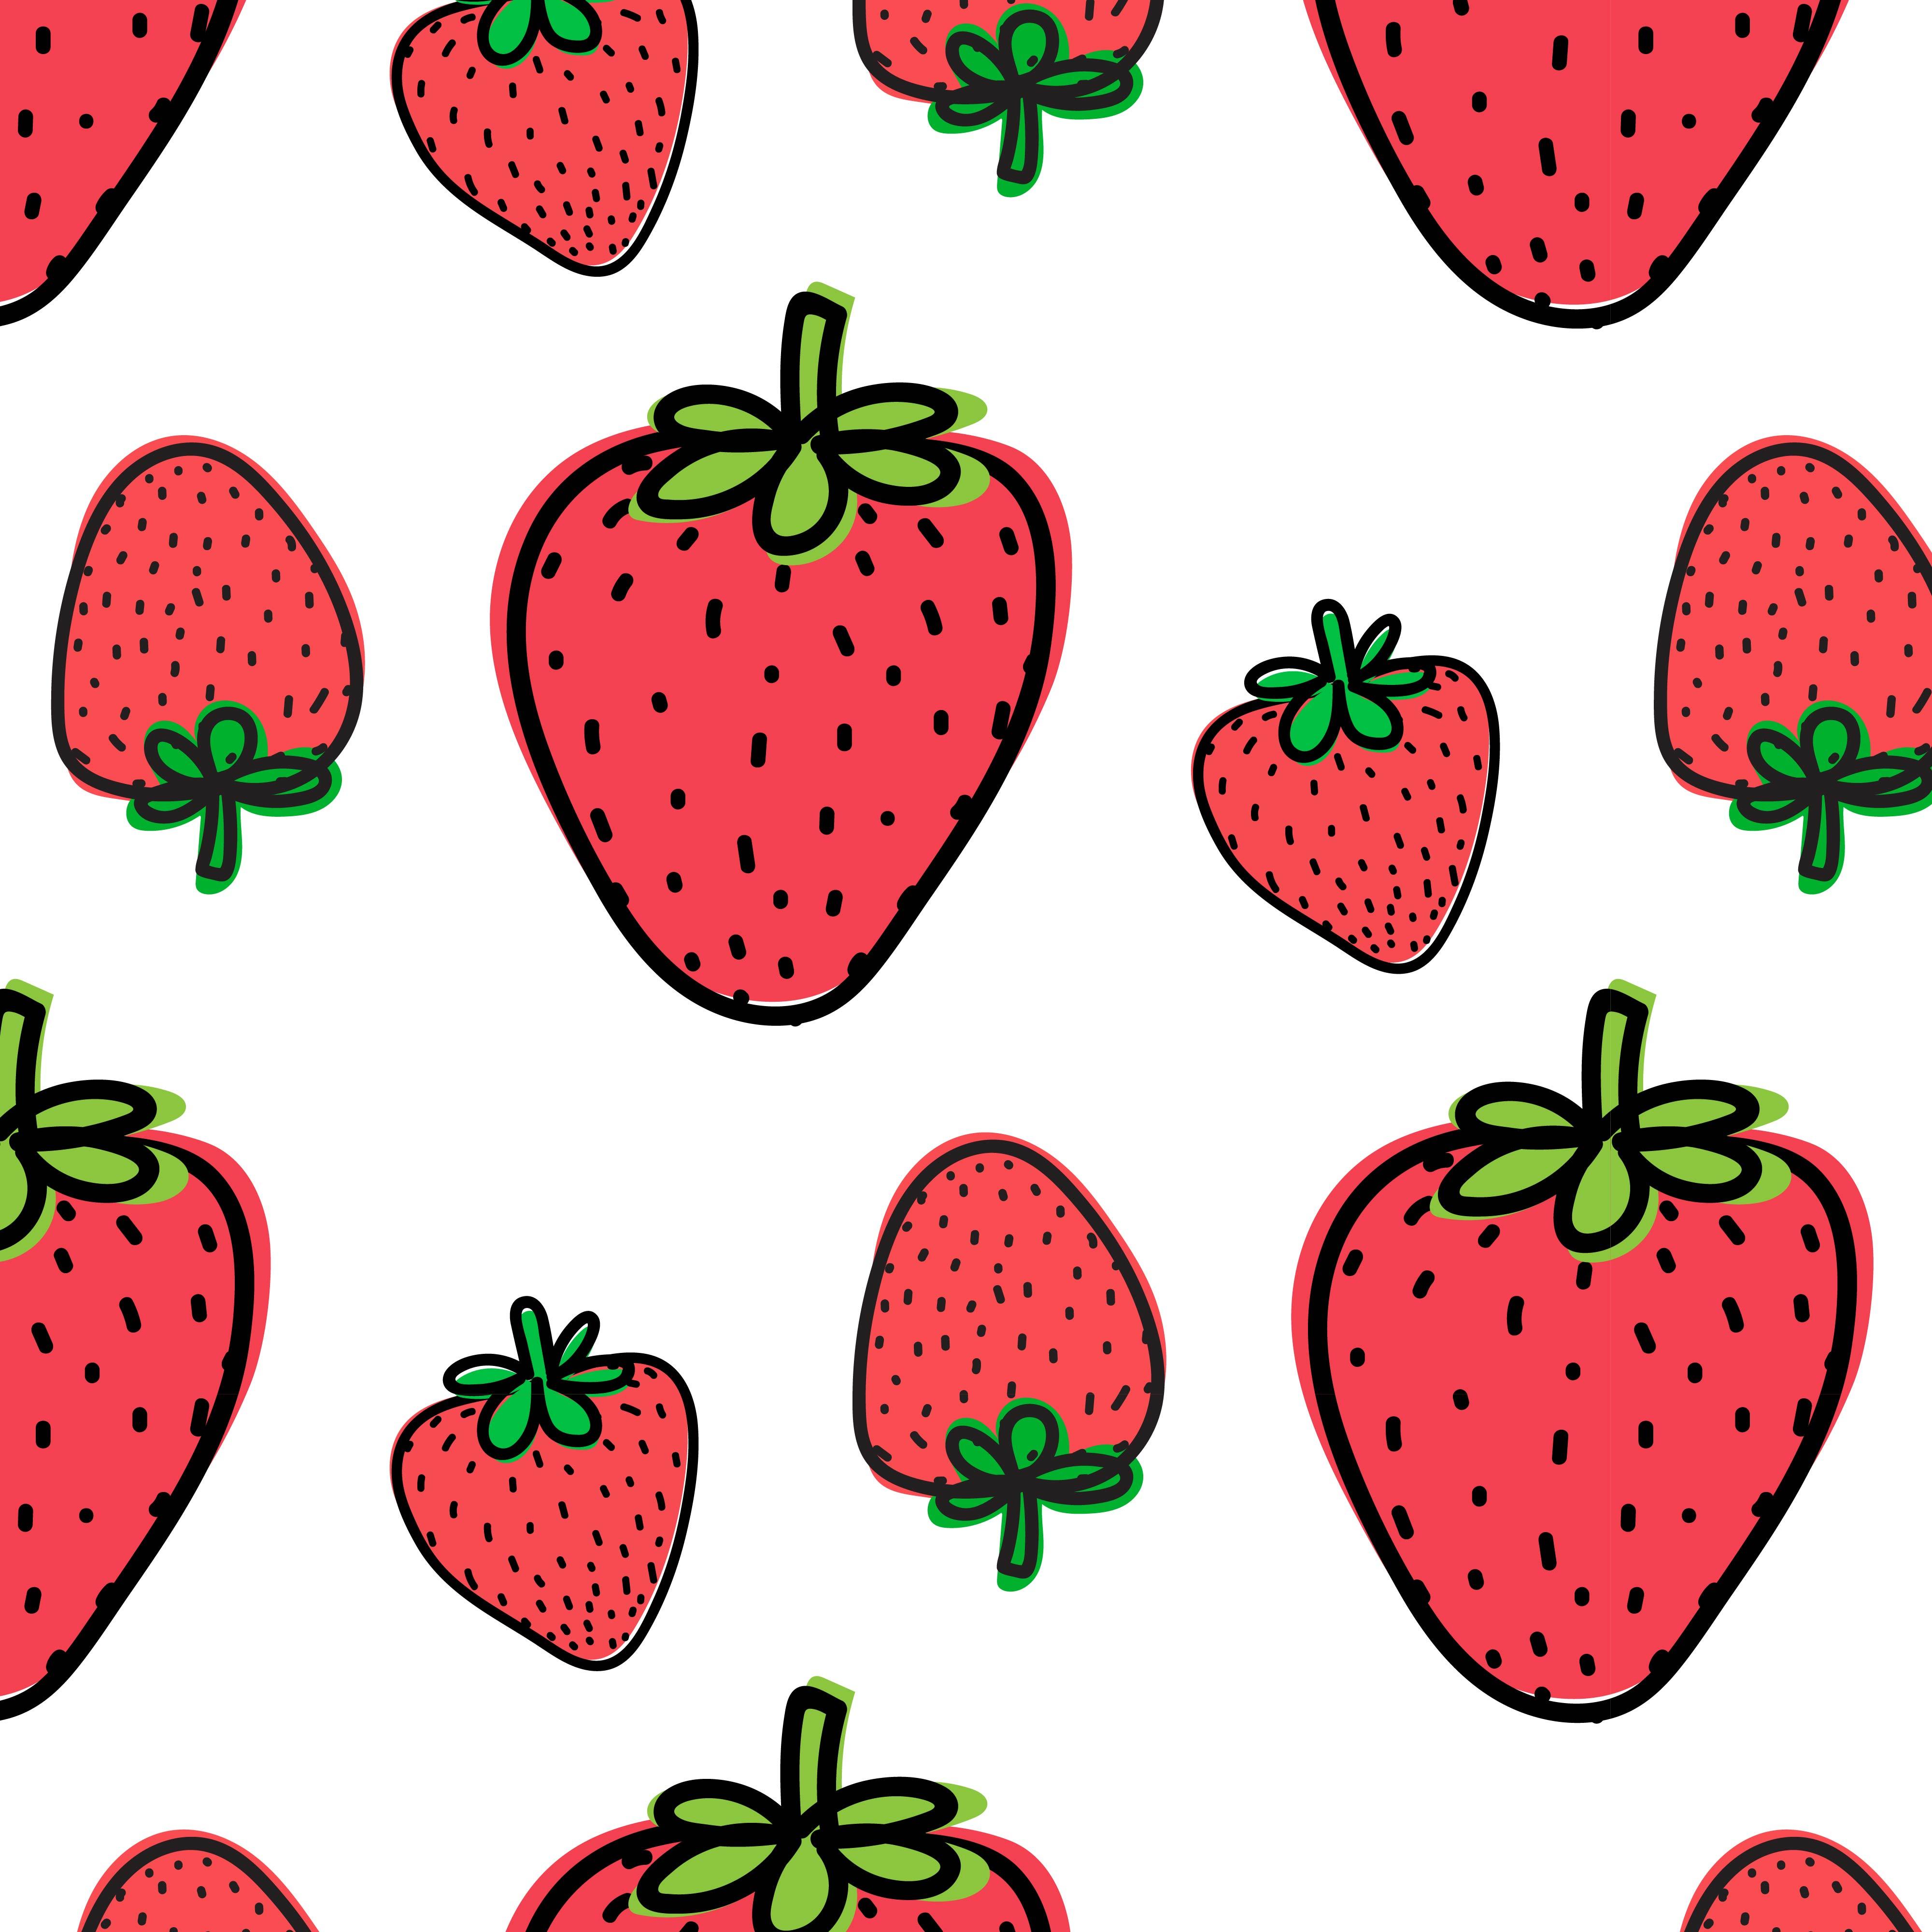 strawberry fruit pattern background vector illustration download free vectors clipart graphics vector art vecteezy